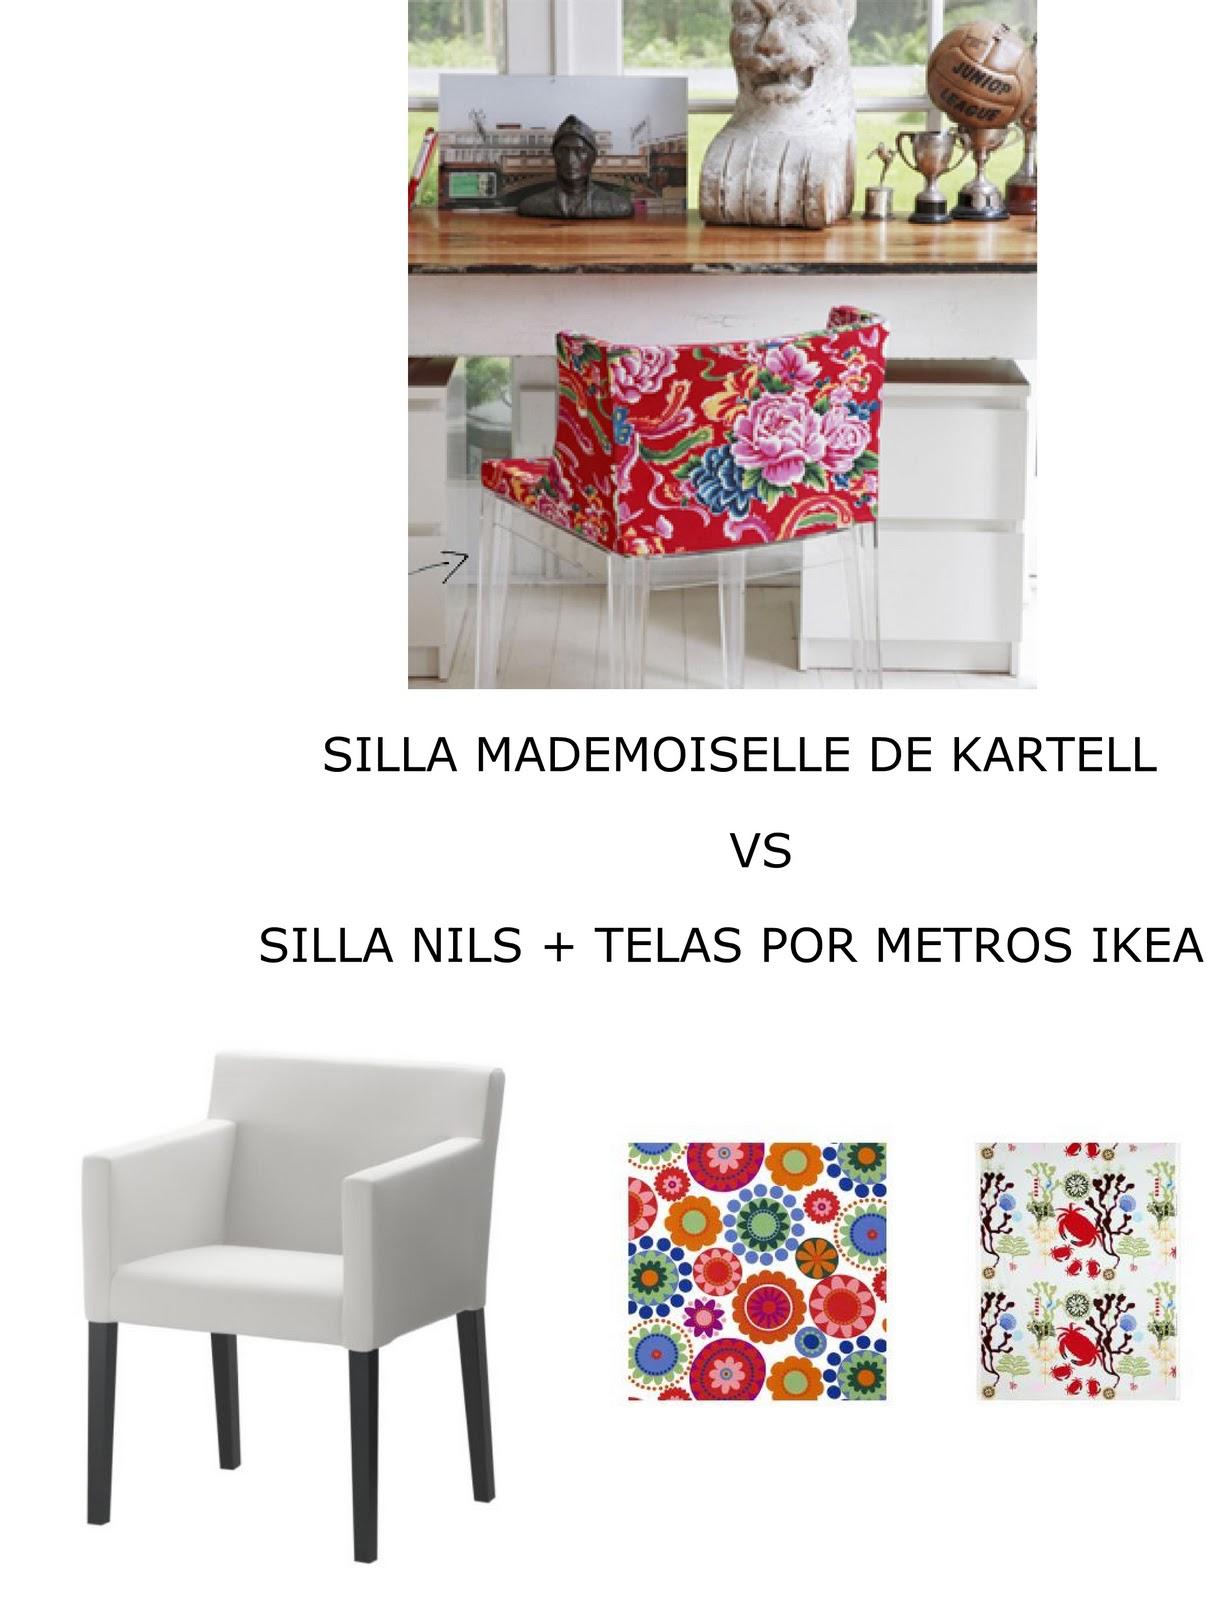 Parecidos razonables sillas mademoiselle de kartell vs silla nils ikea - Sillas con reposabrazos ikea ...